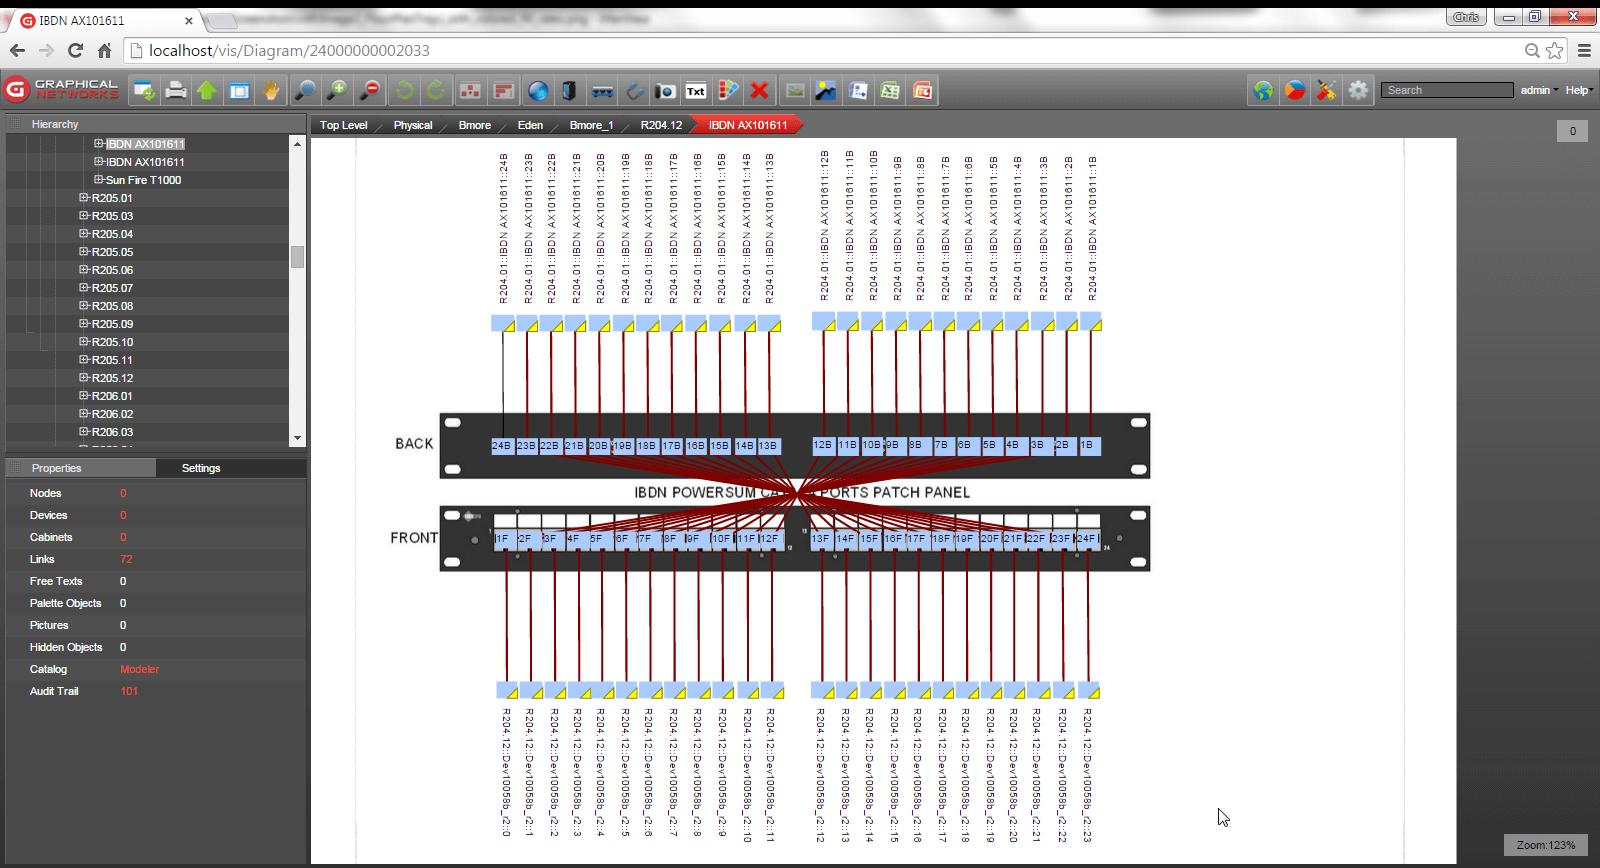 [WRG-6653] Fiber Patch Panel Wiring Diagram